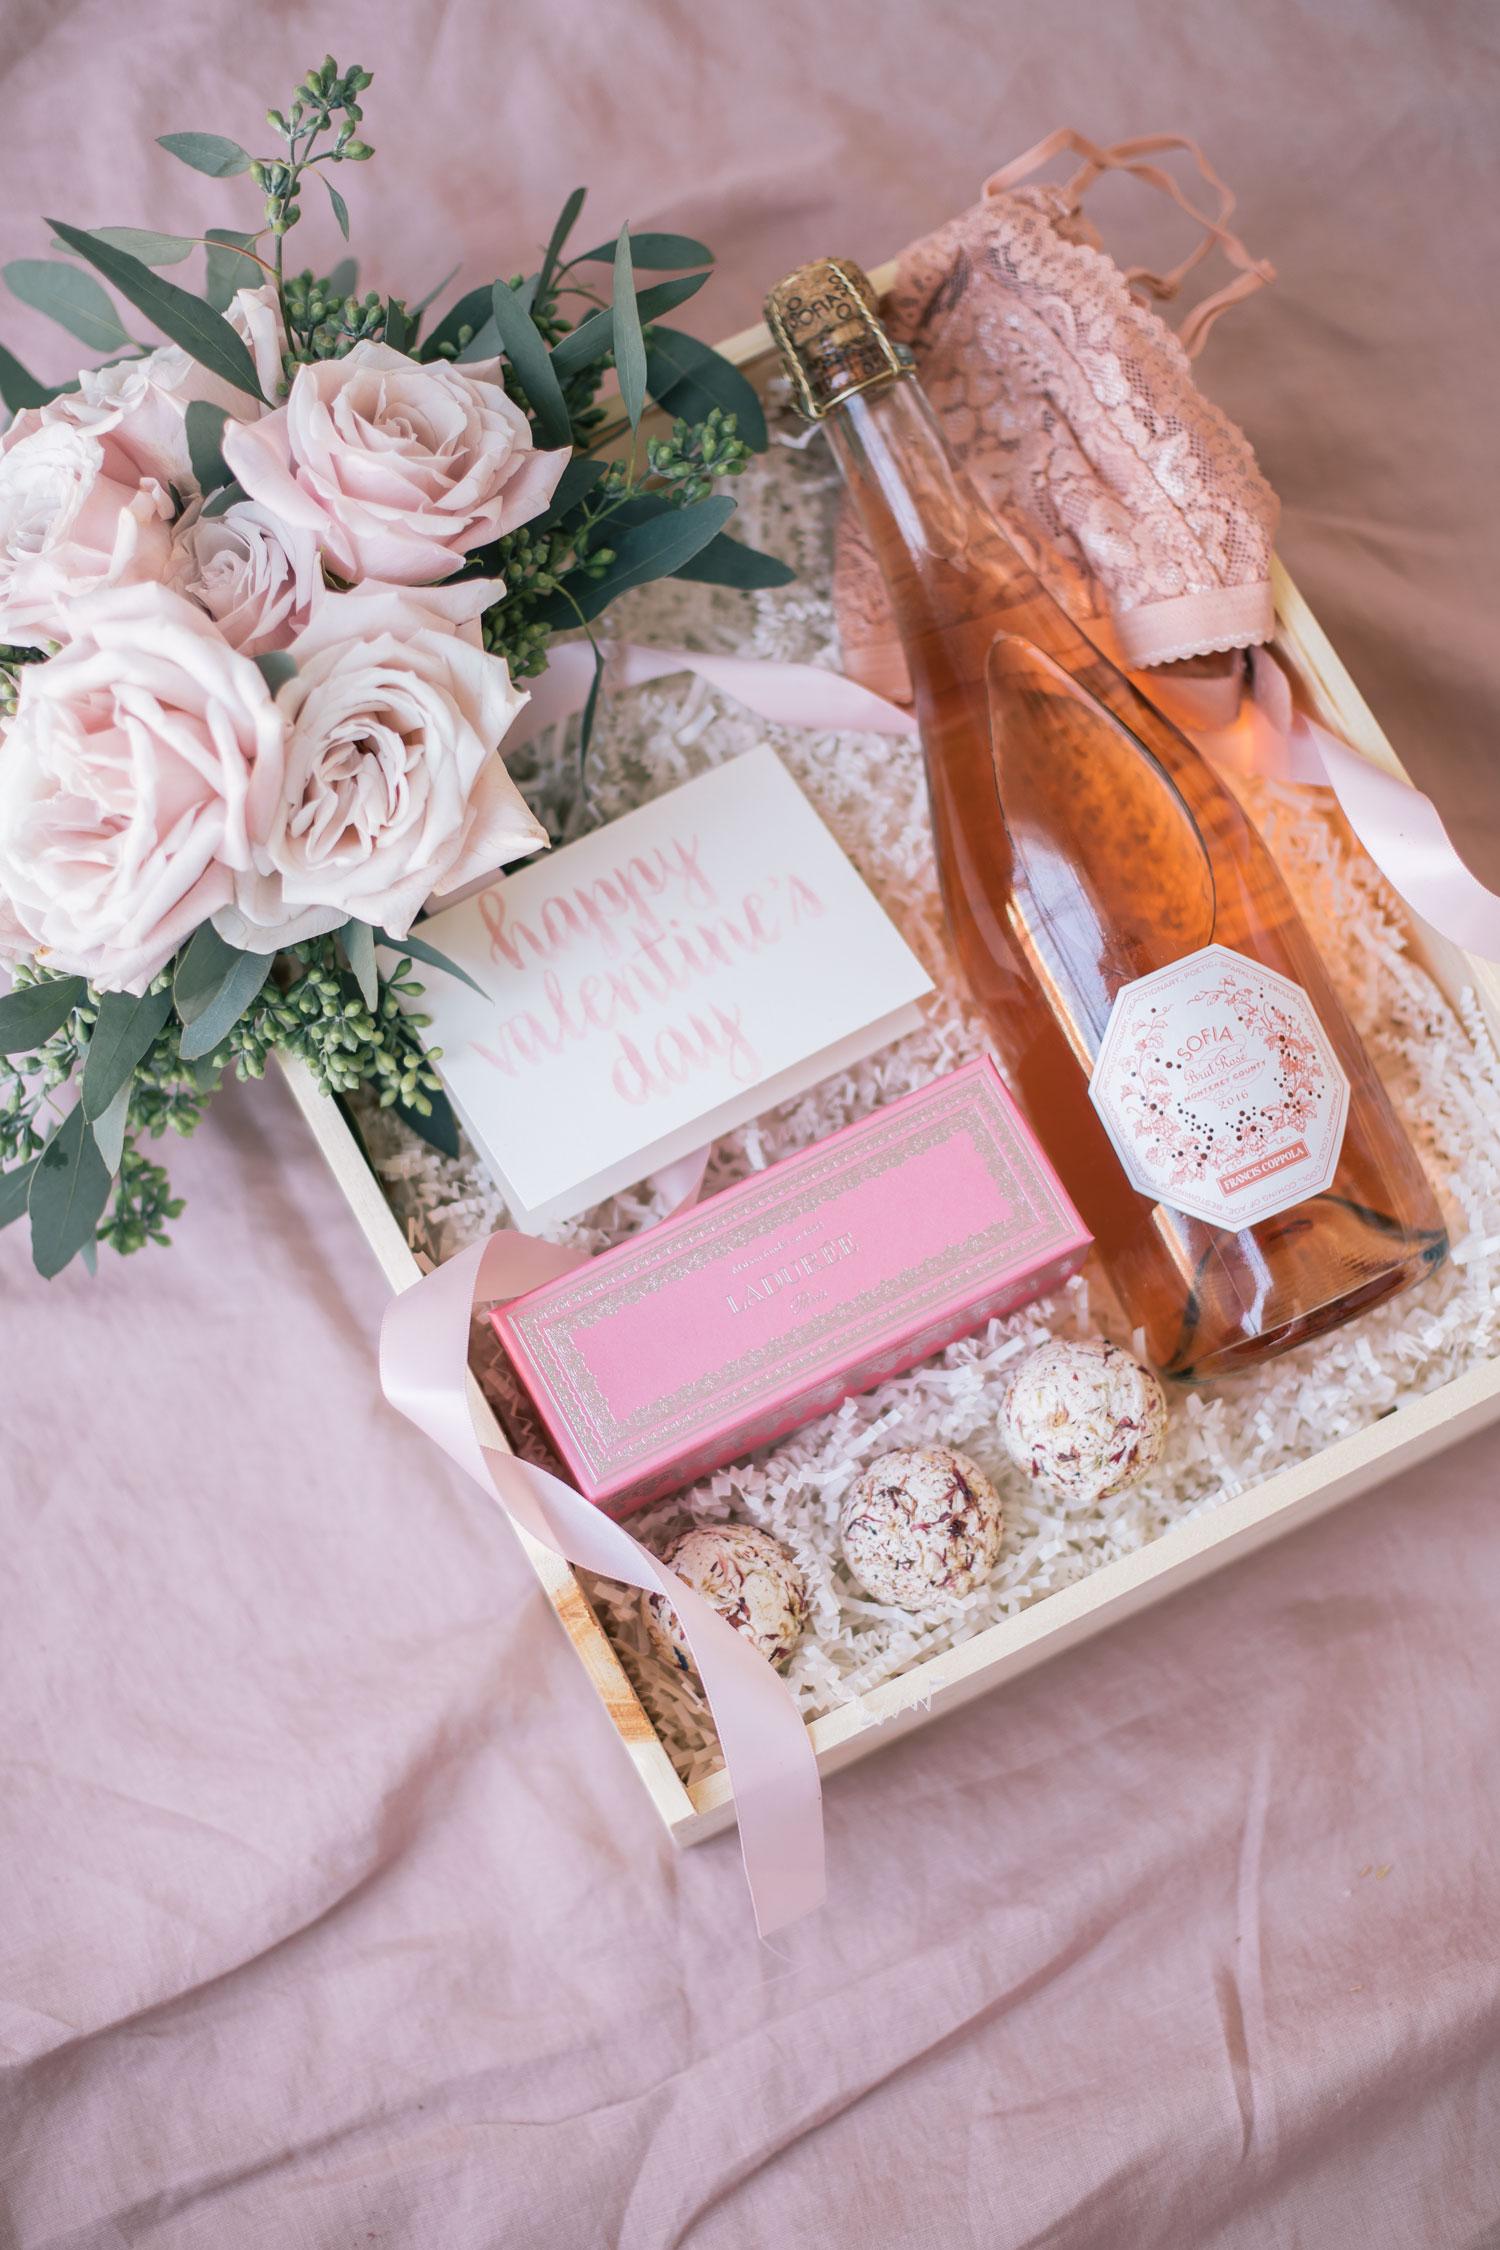 The Prettiest Diy Valentine S Day Gift Box The Blondielocks Life